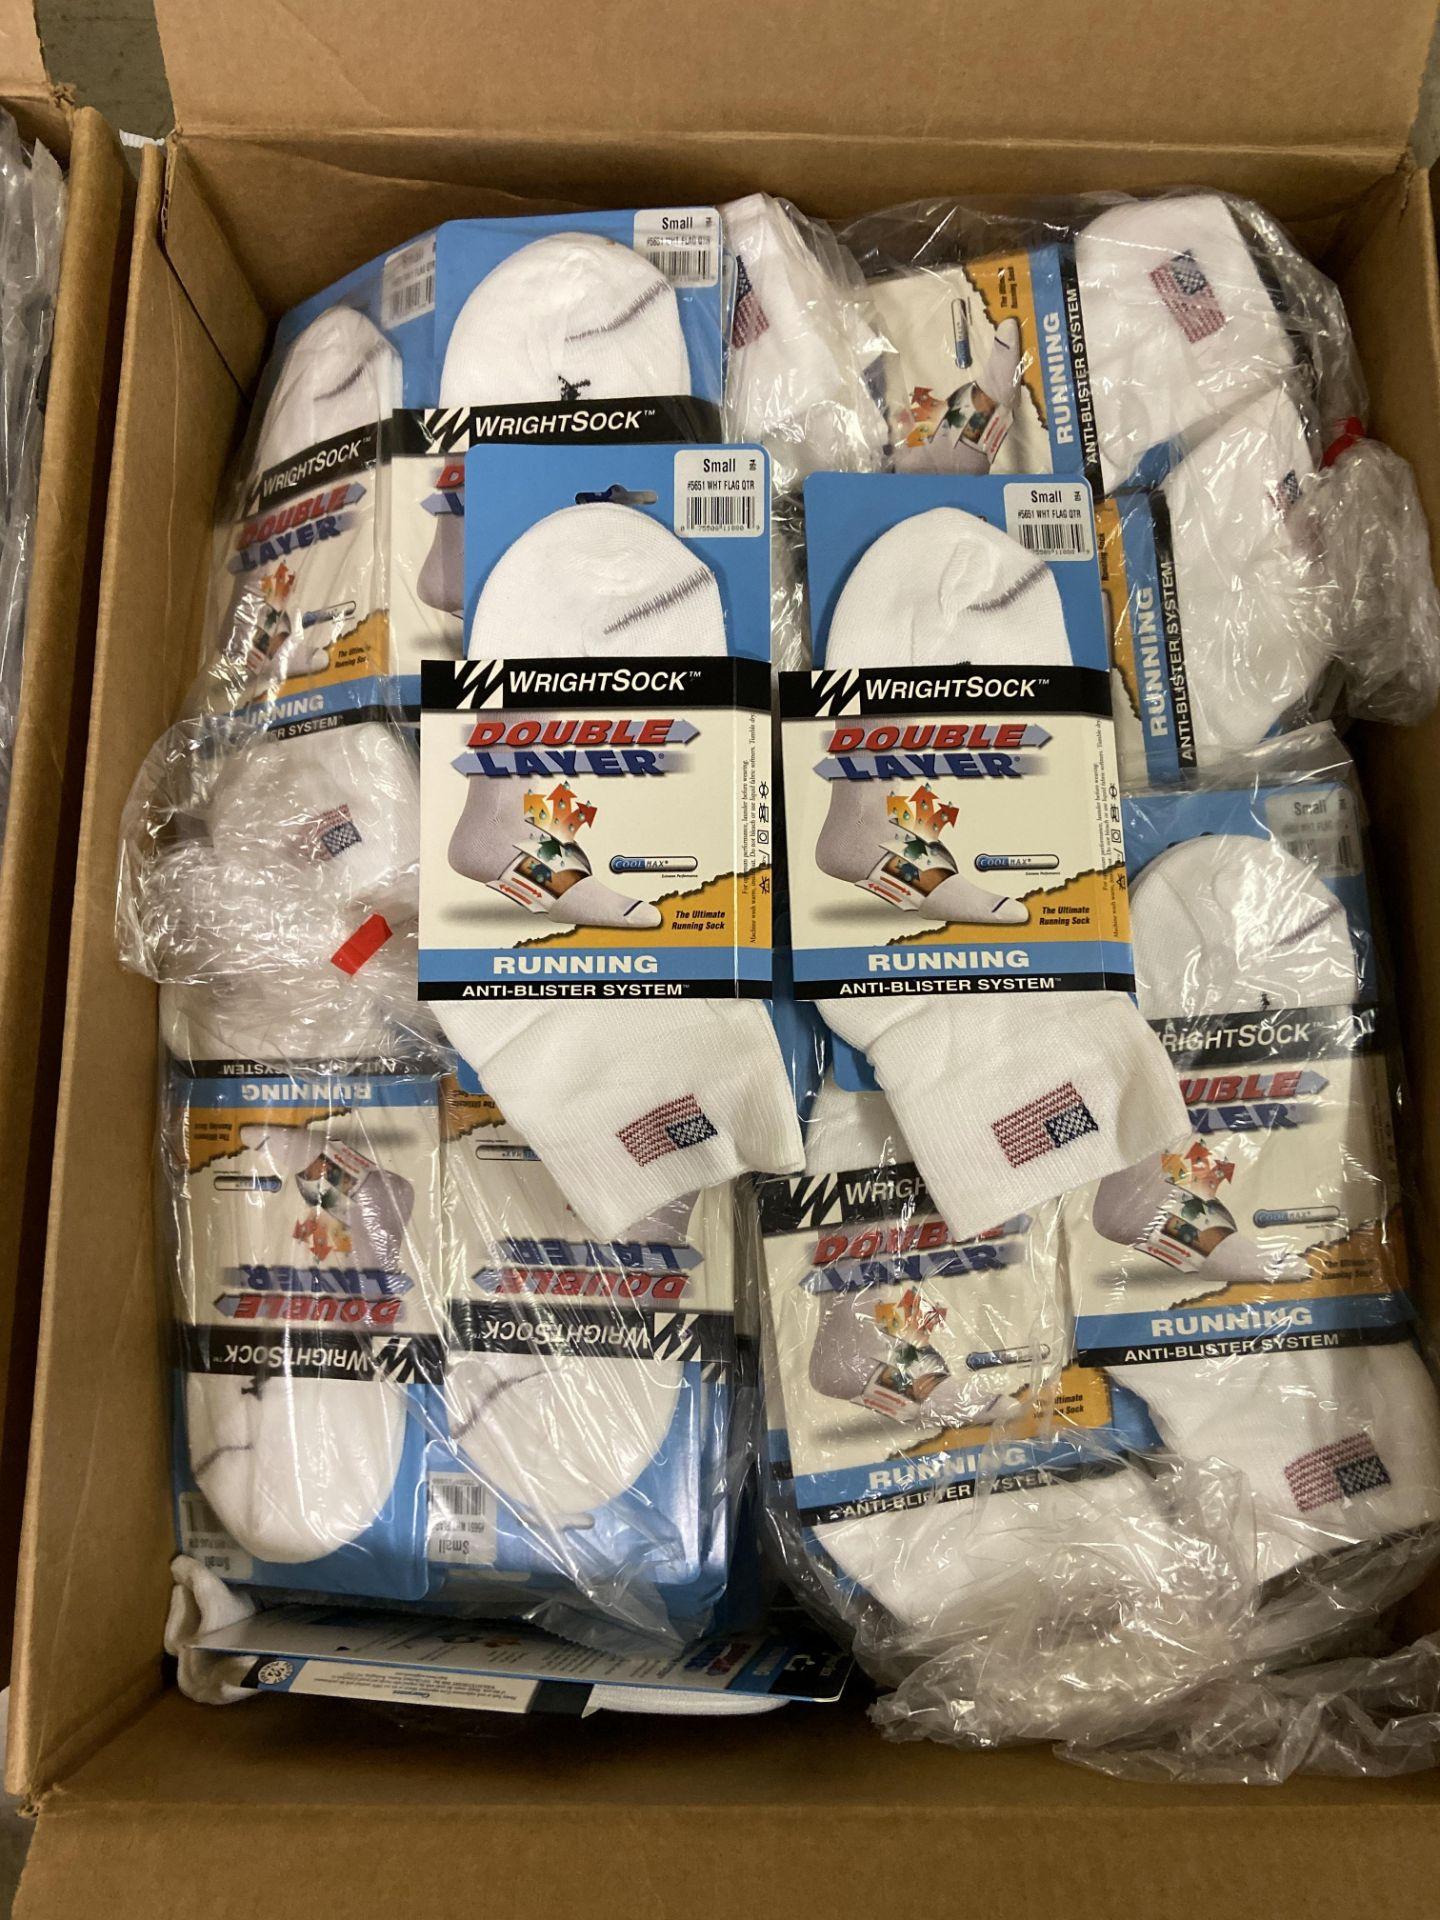 500+ packs of New Socks, Wrightsock Running, Double Layer, USA America Flag White - Image 2 of 5